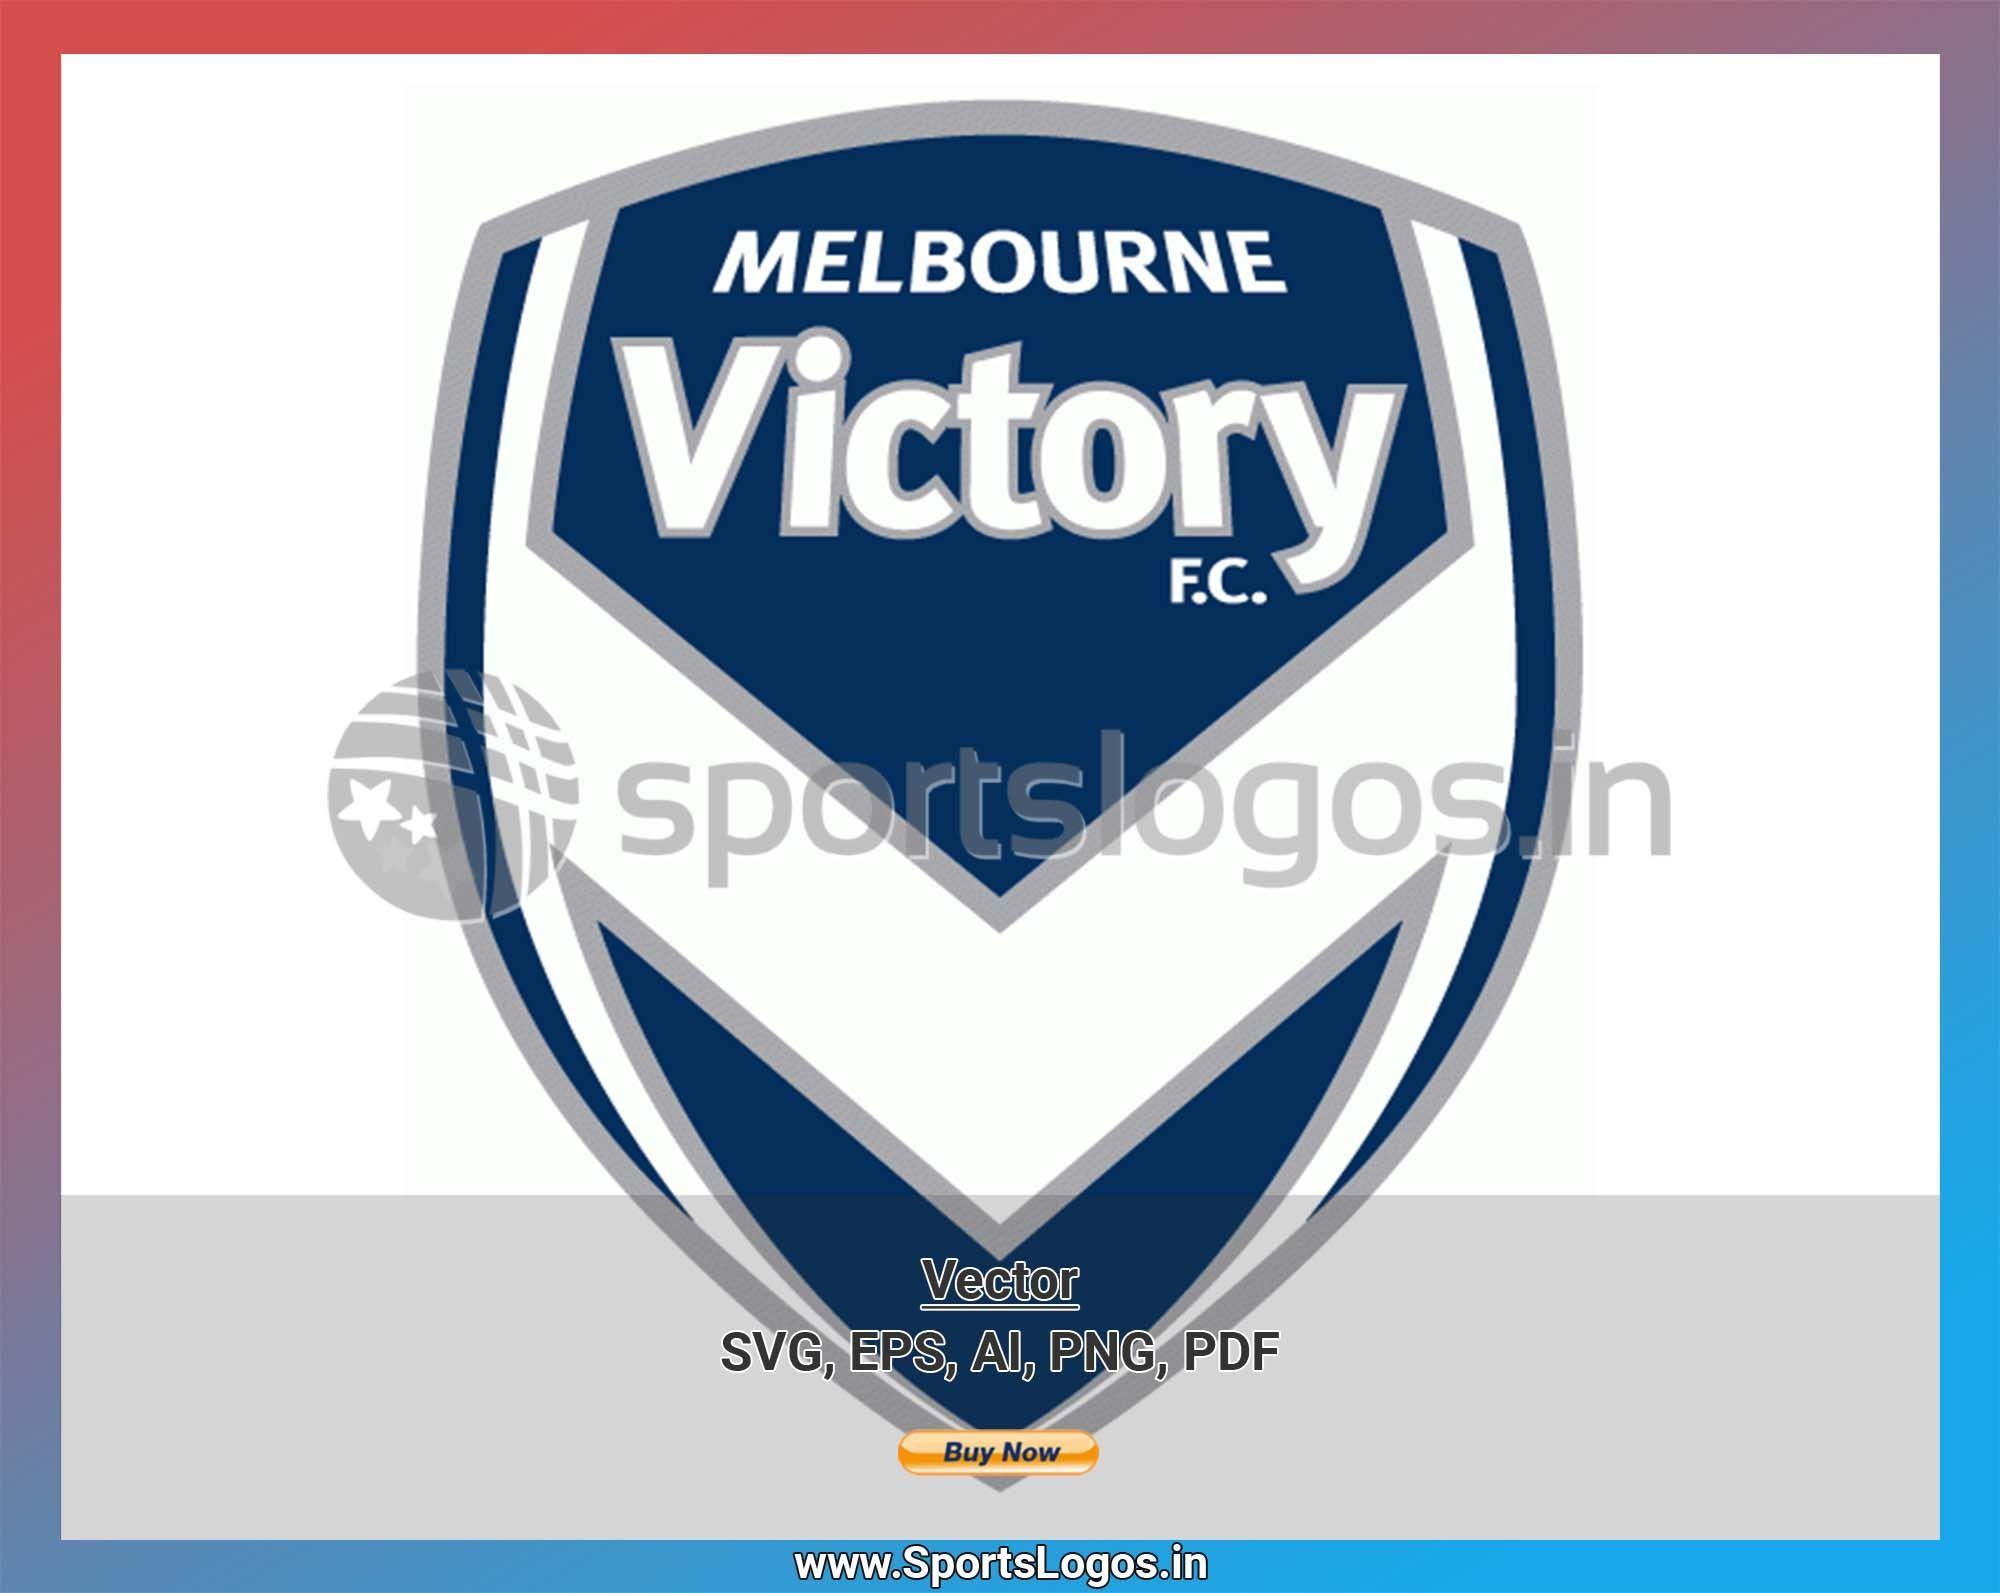 Pin on Vector & SVG Logos for NHL, NFL, MLB, NBA, MiLB